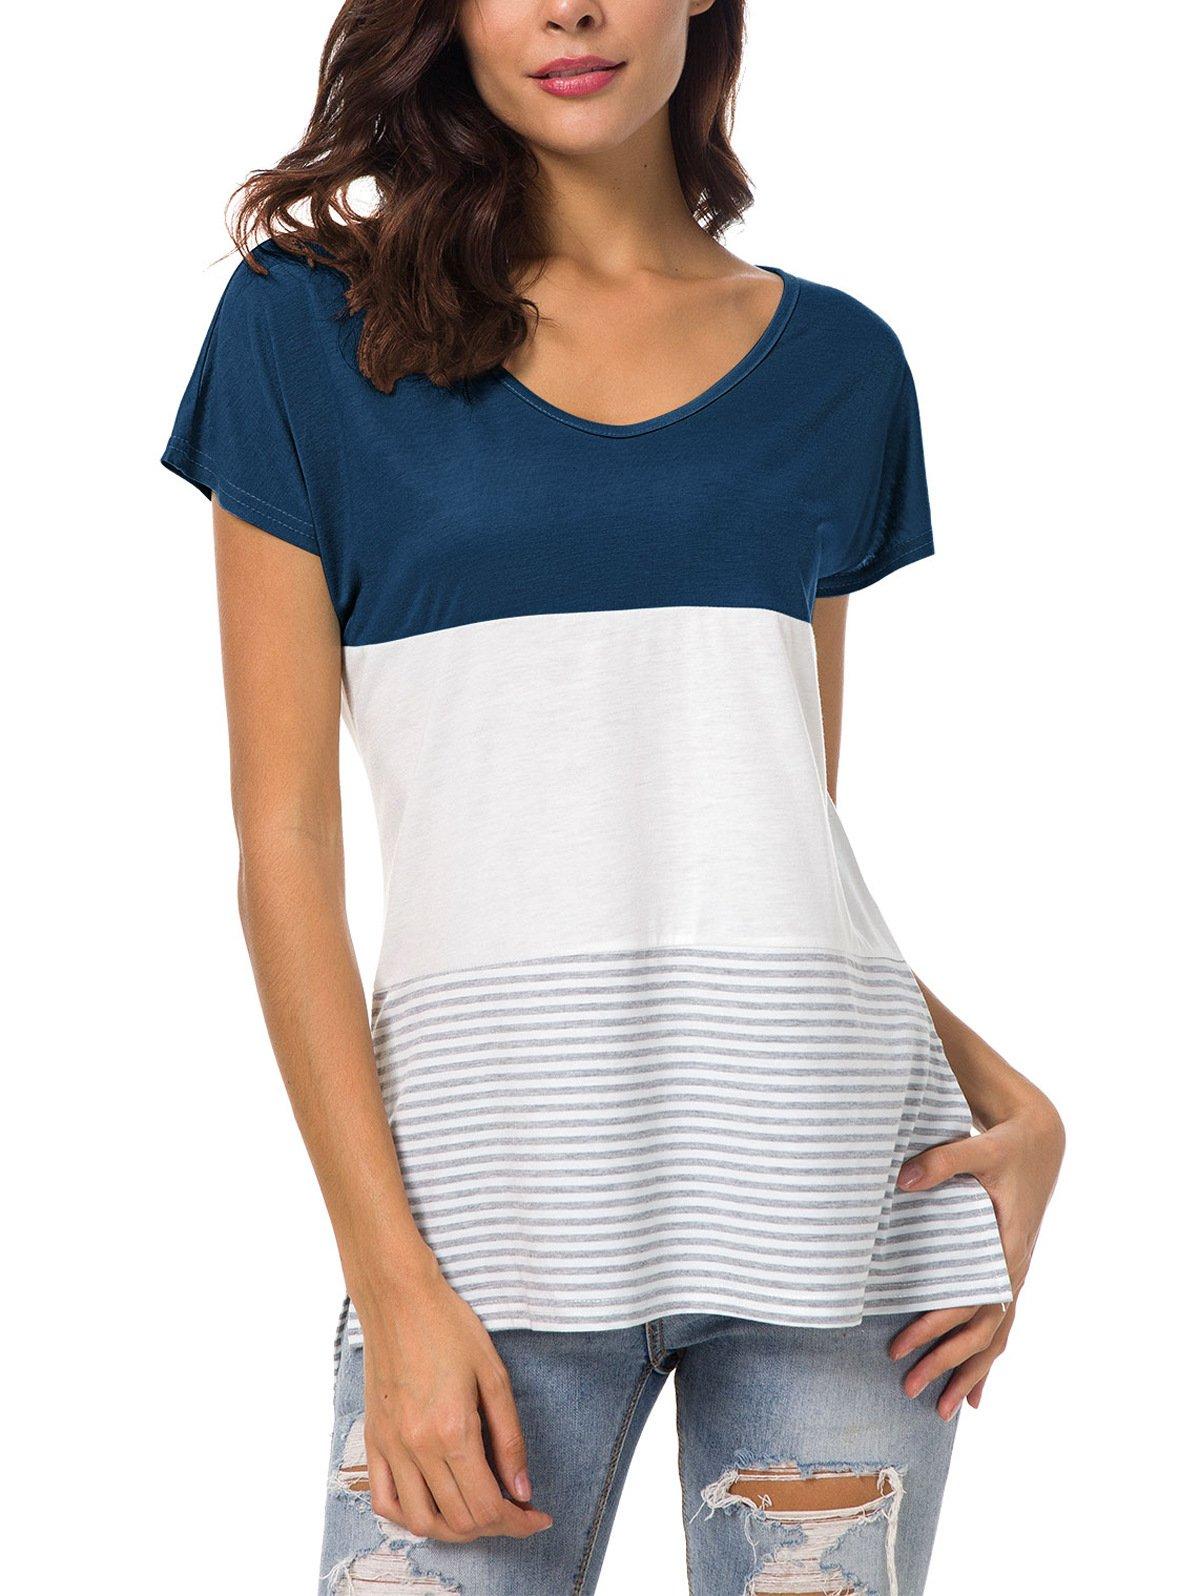 Lanremon Women's Summer V Neck Triple Color Block Striped T-Shirt Side Split Casual Tops Blouse Dark Blue L